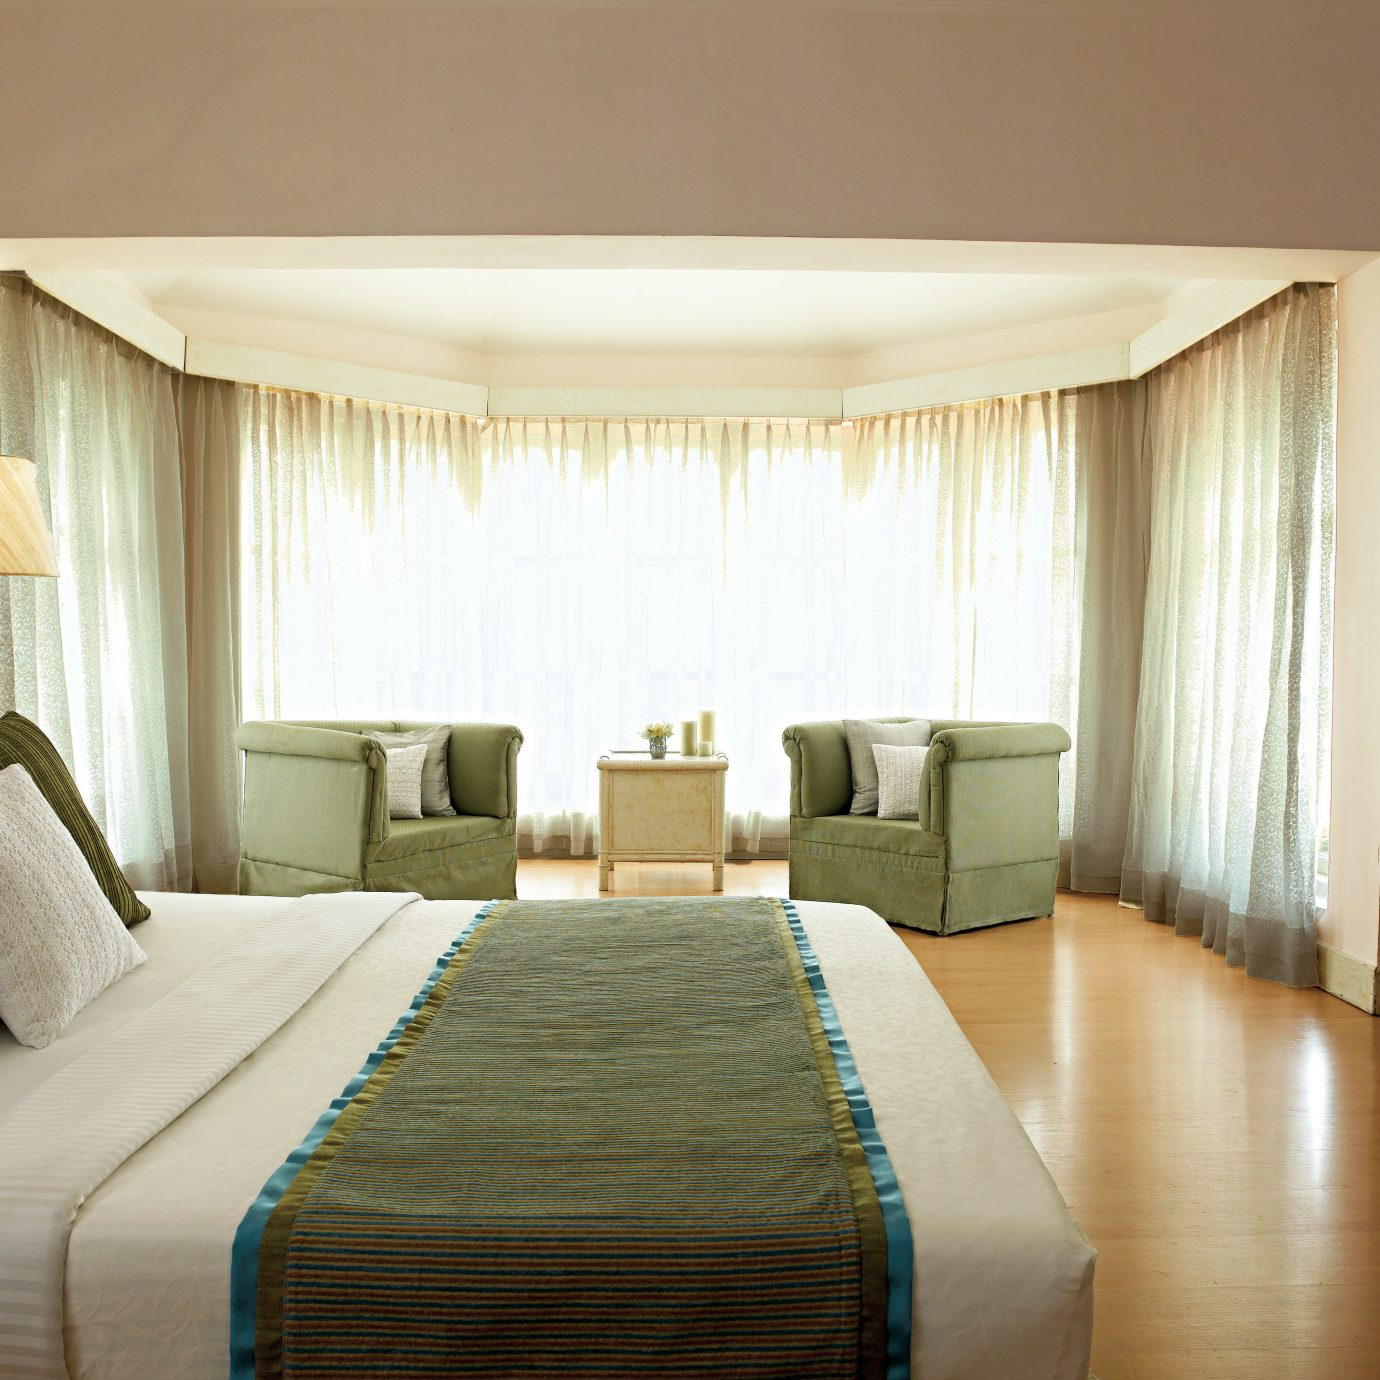 Bedroom Classic Elegant Lounge Suite pillow